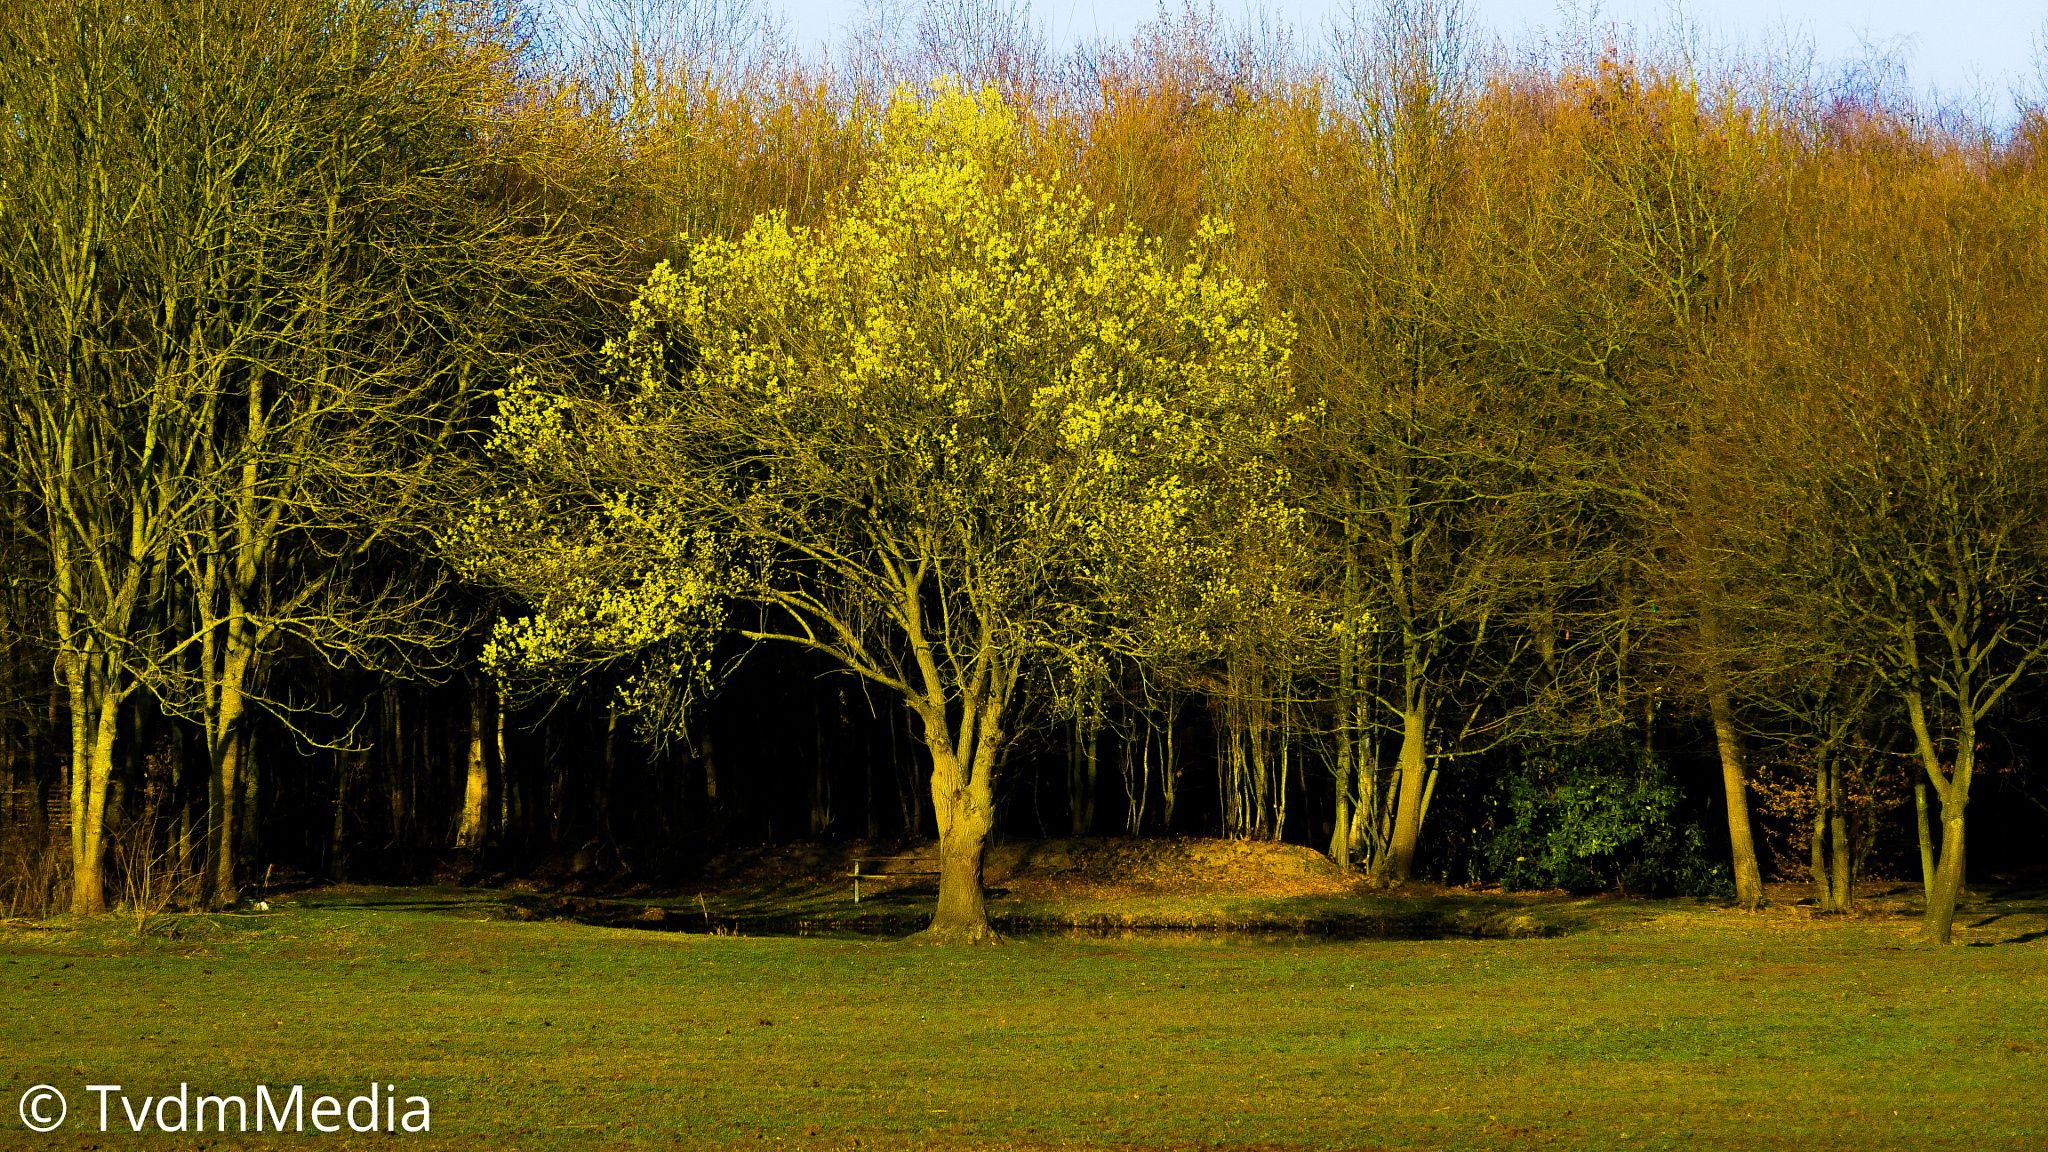 Tree by Ton van de Merwe on 500px